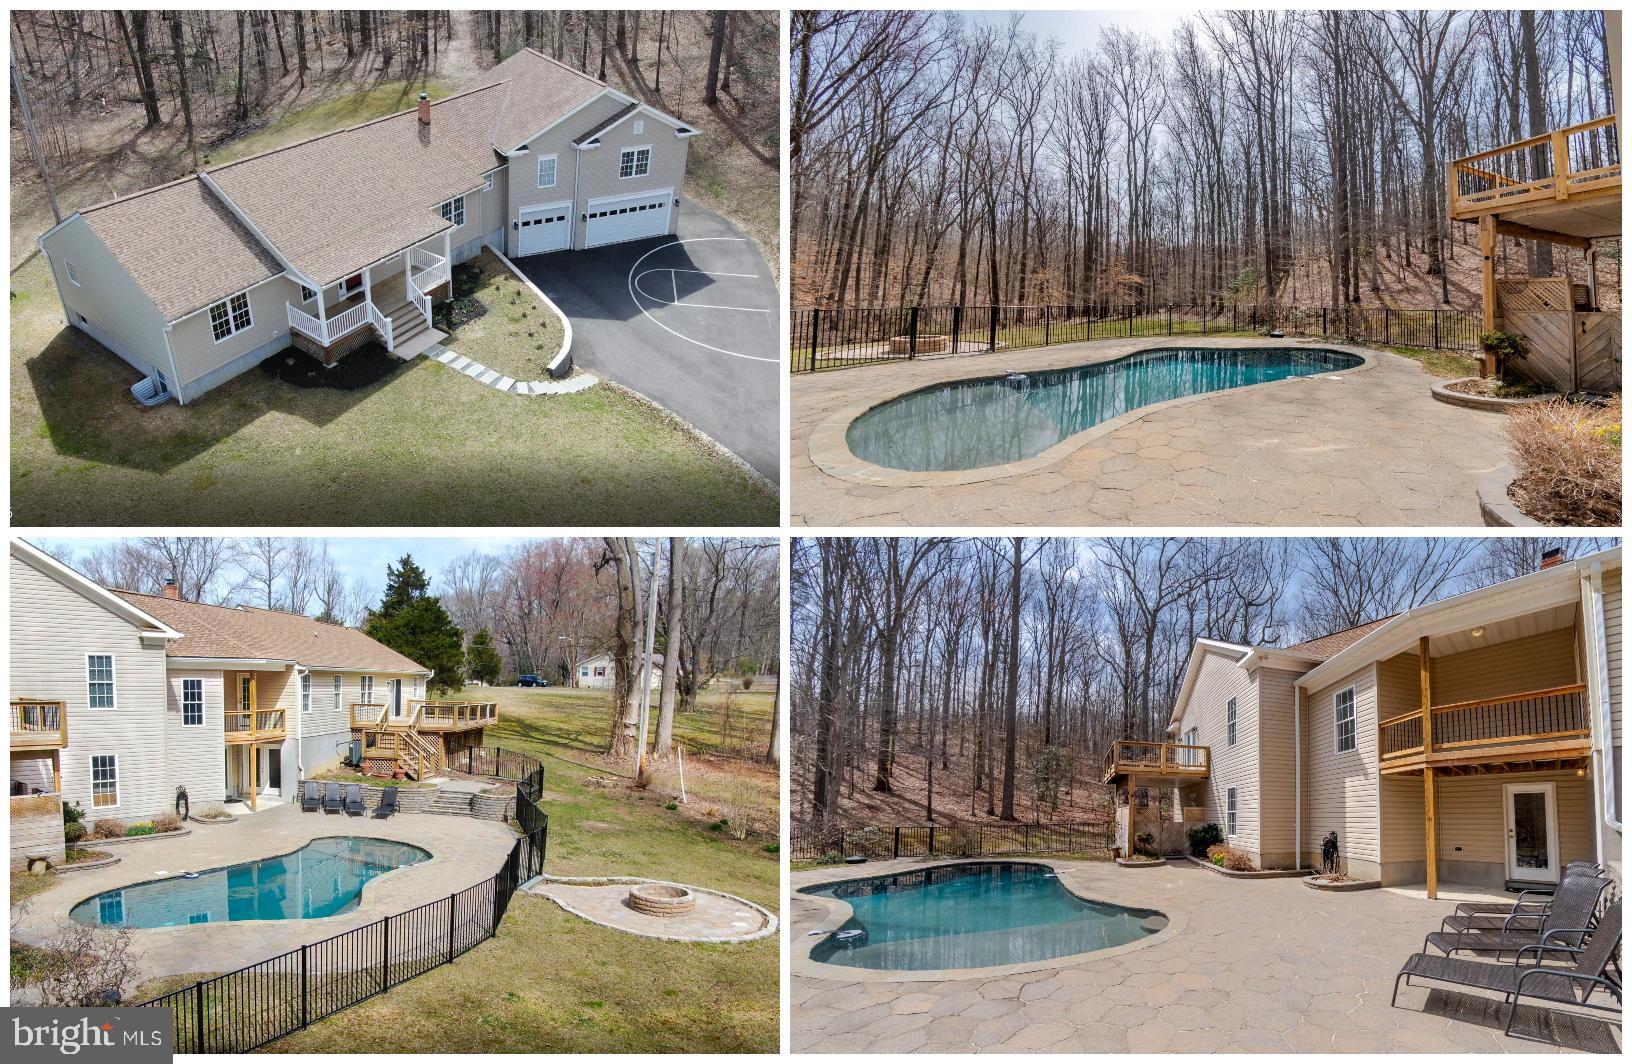 1448 HOPPA ROAD, CROWNSVILLE, Maryland 21032, 6 Bedrooms Bedrooms, ,5 BathroomsBathrooms,Single Family,For Sale,1448 HOPPA ROAD,MDAA462202